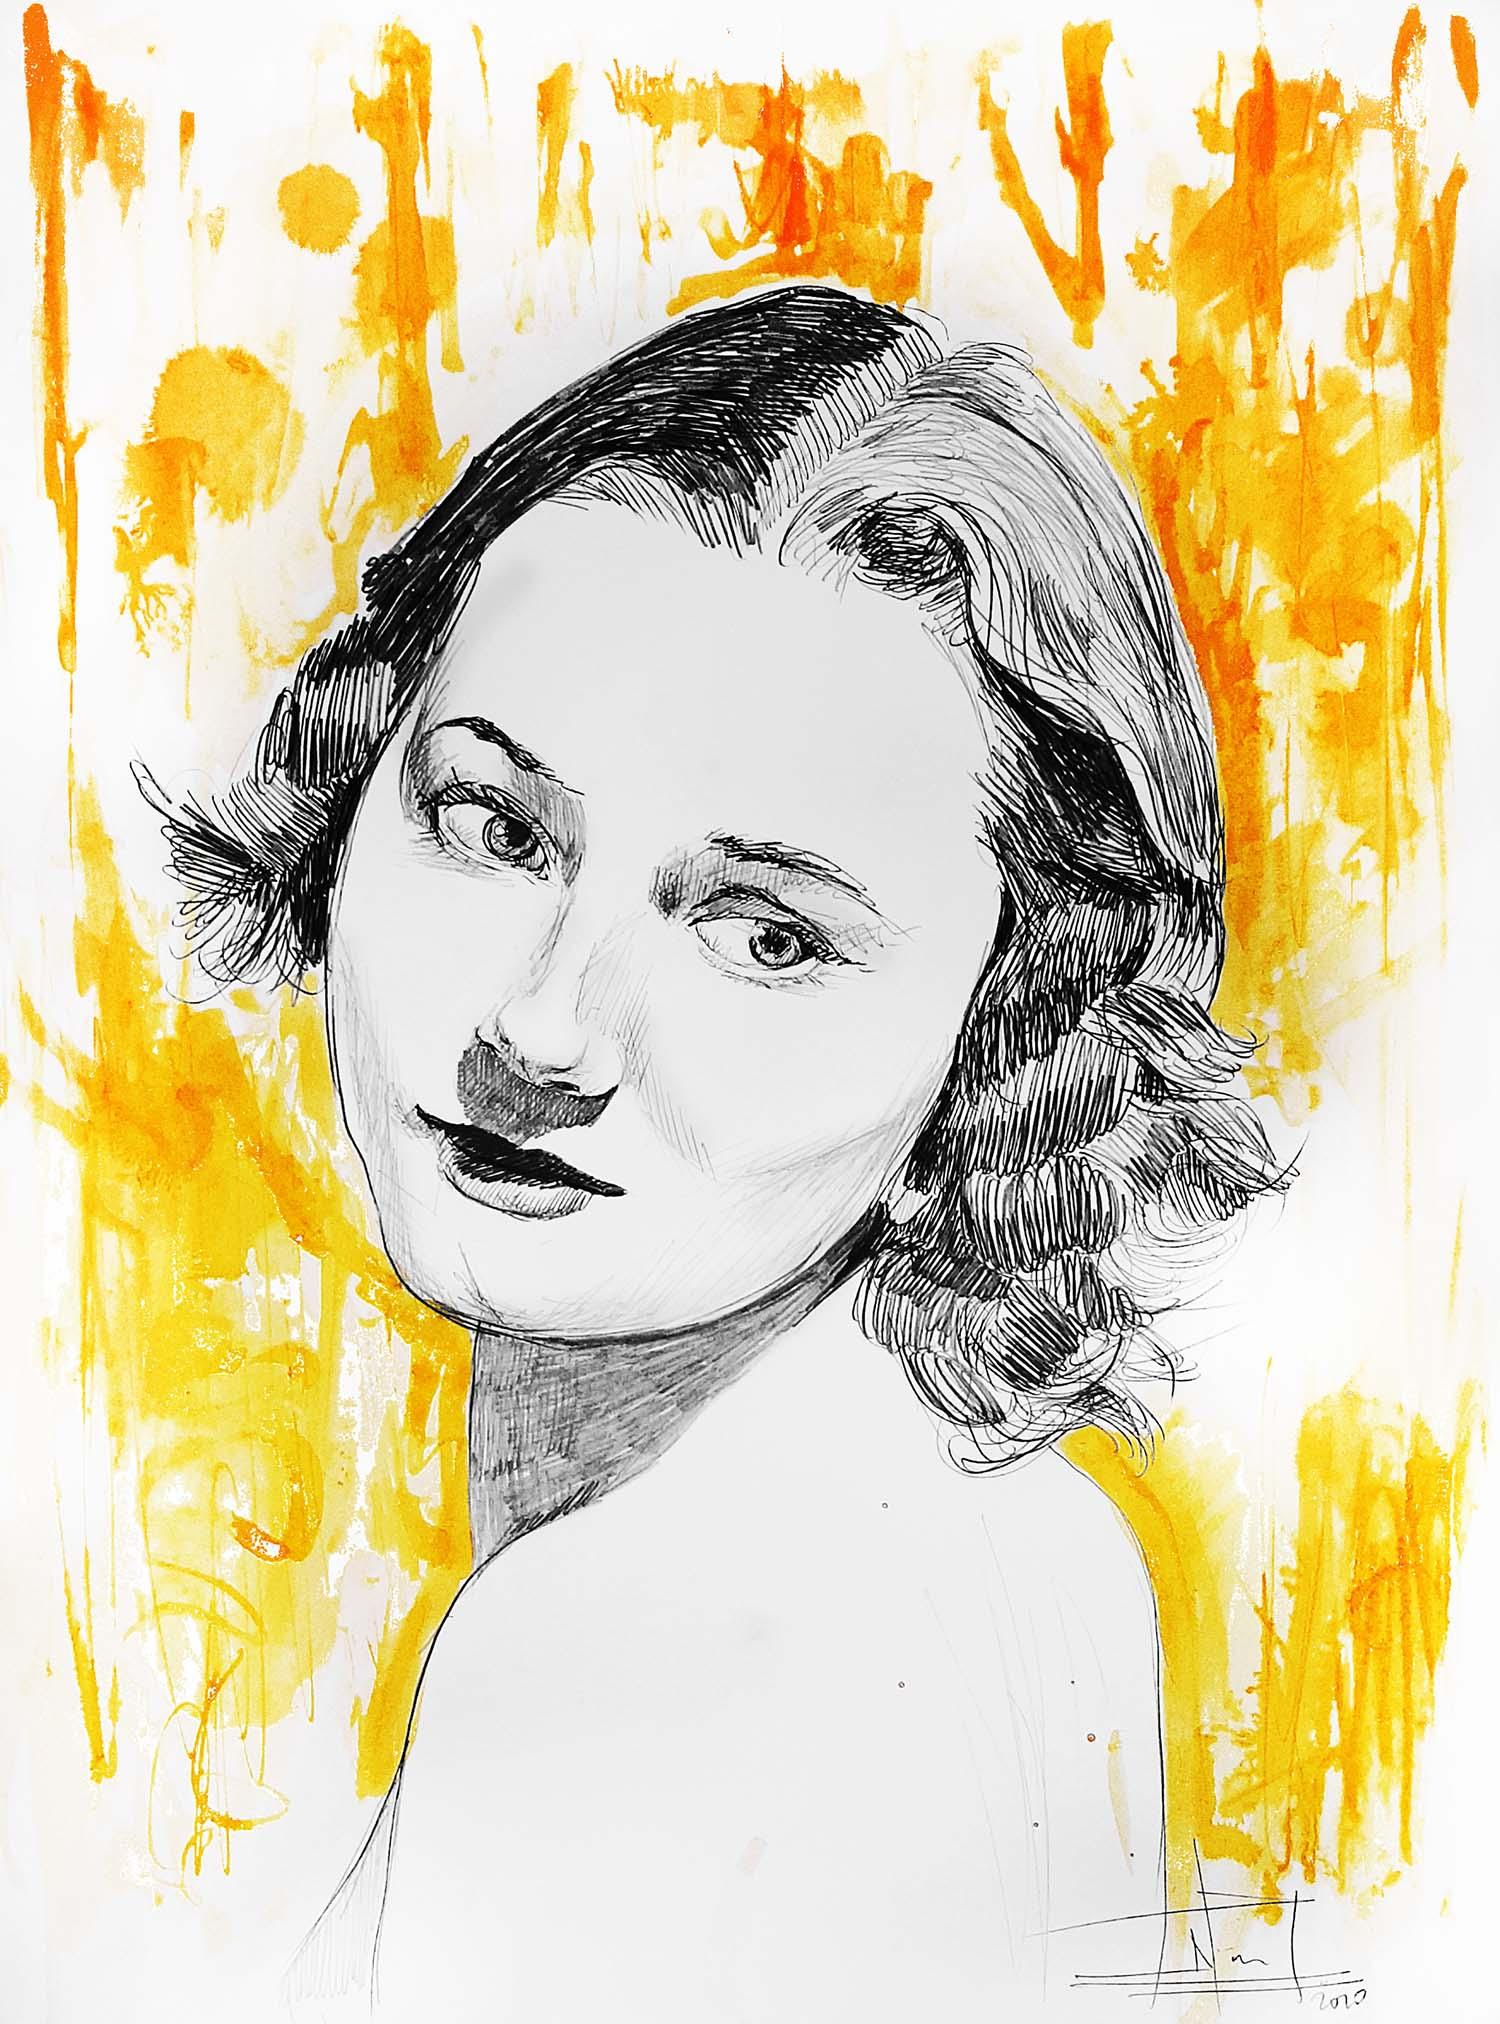 Ms de Havilland